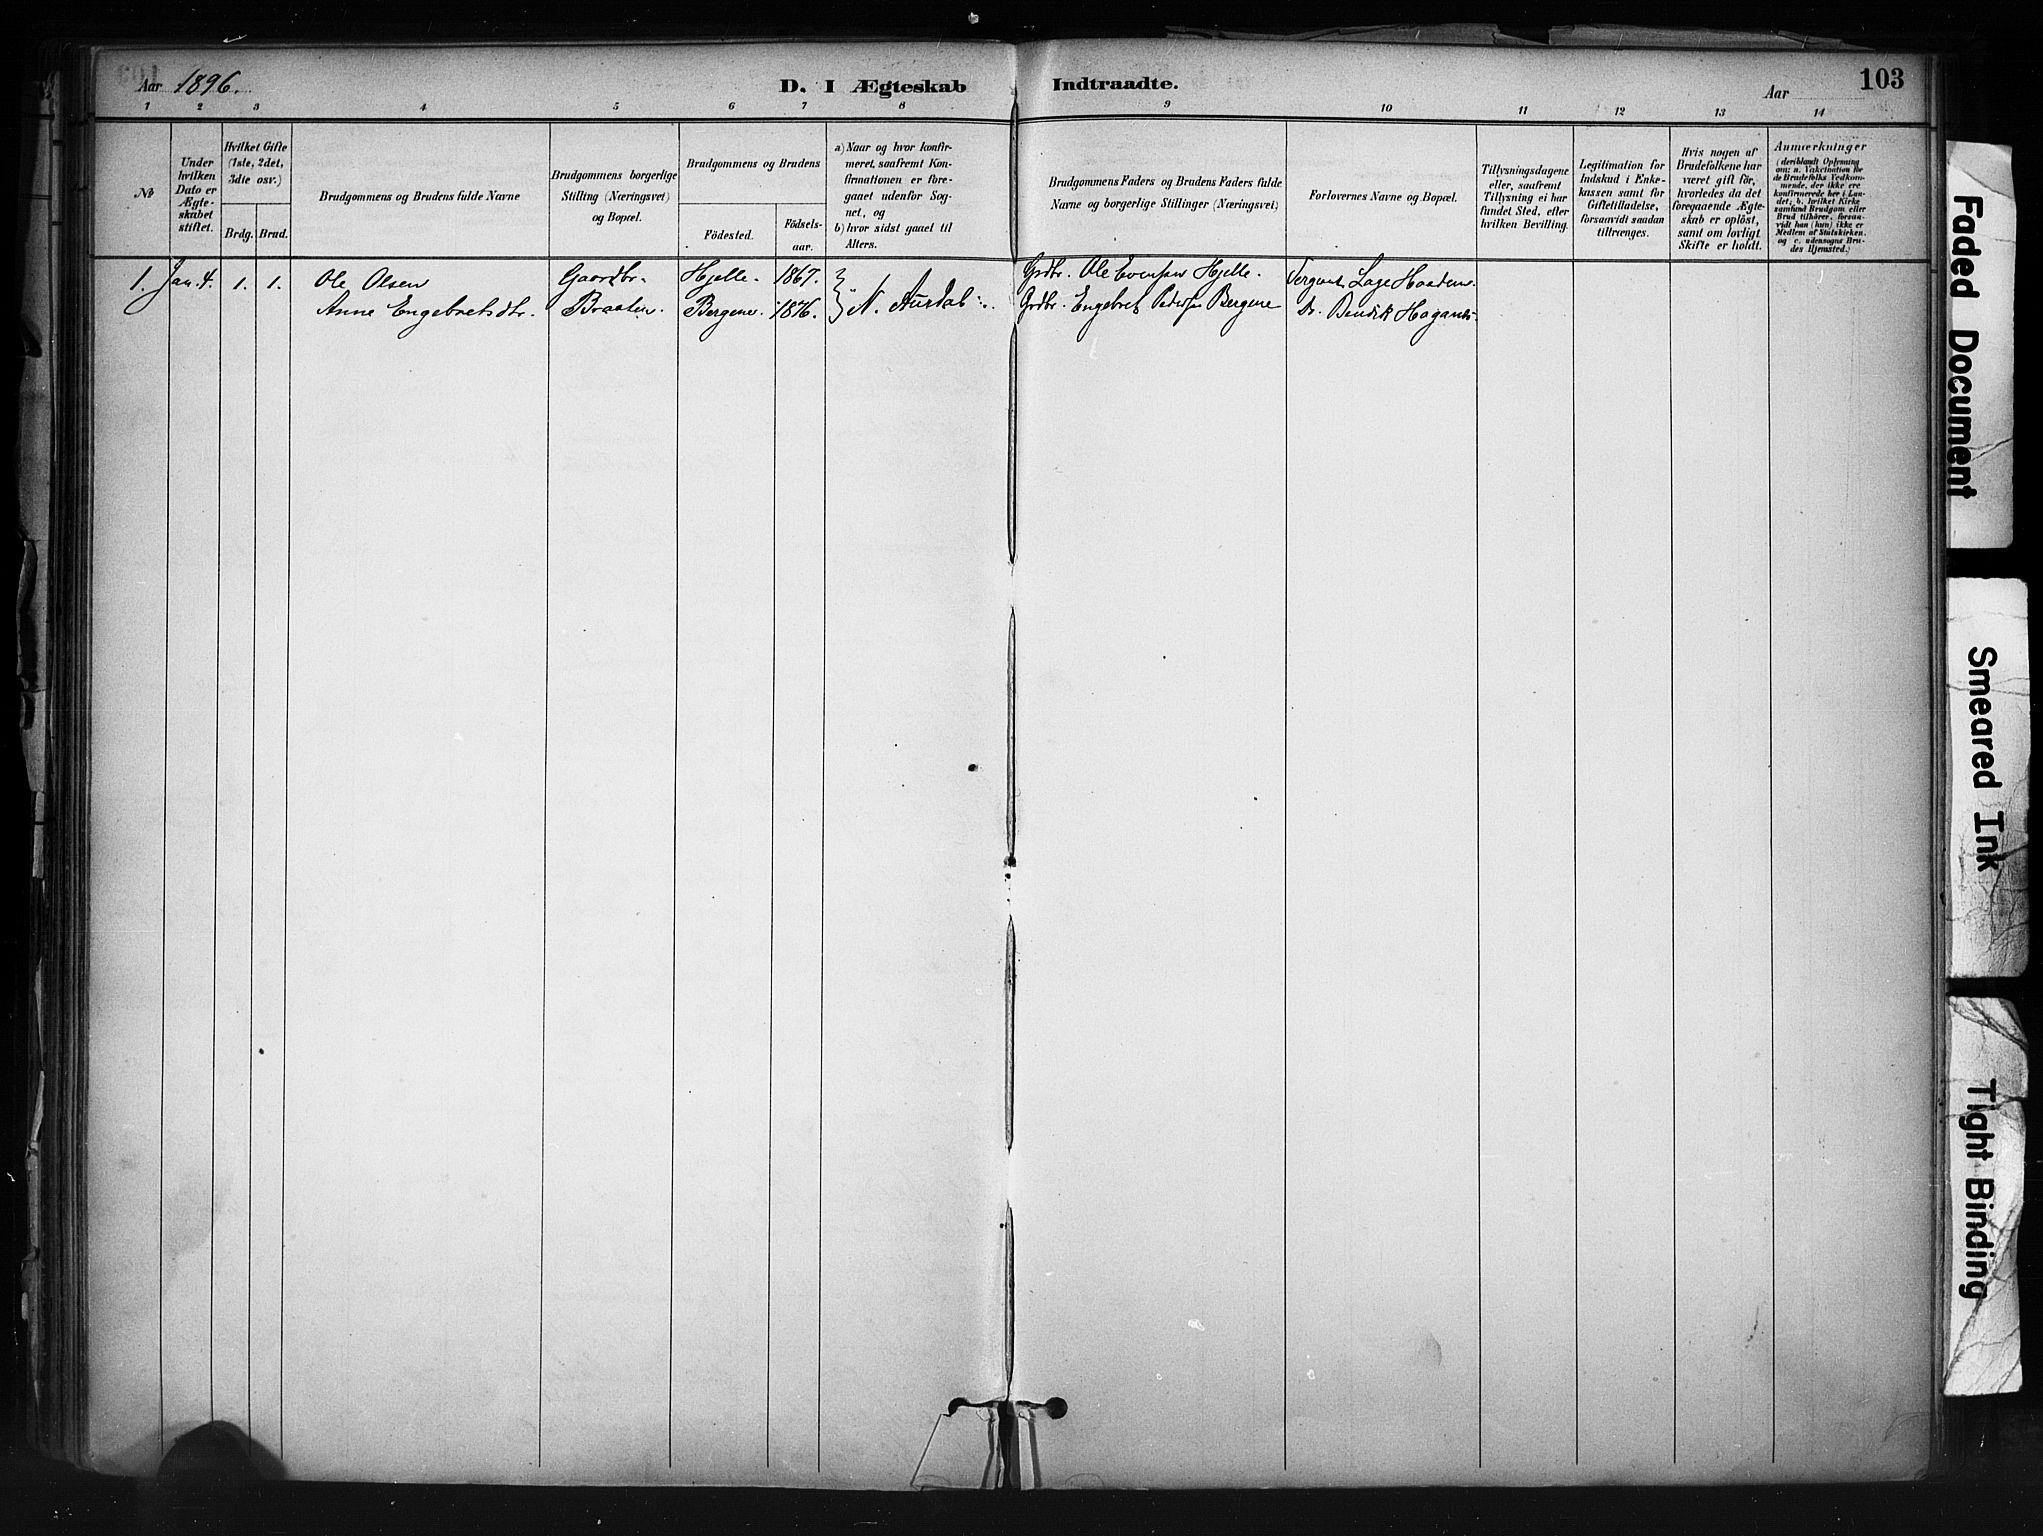 SAH, Nord-Aurdal prestekontor, Ministerialbok nr. 13, 1883-1895, s. 103